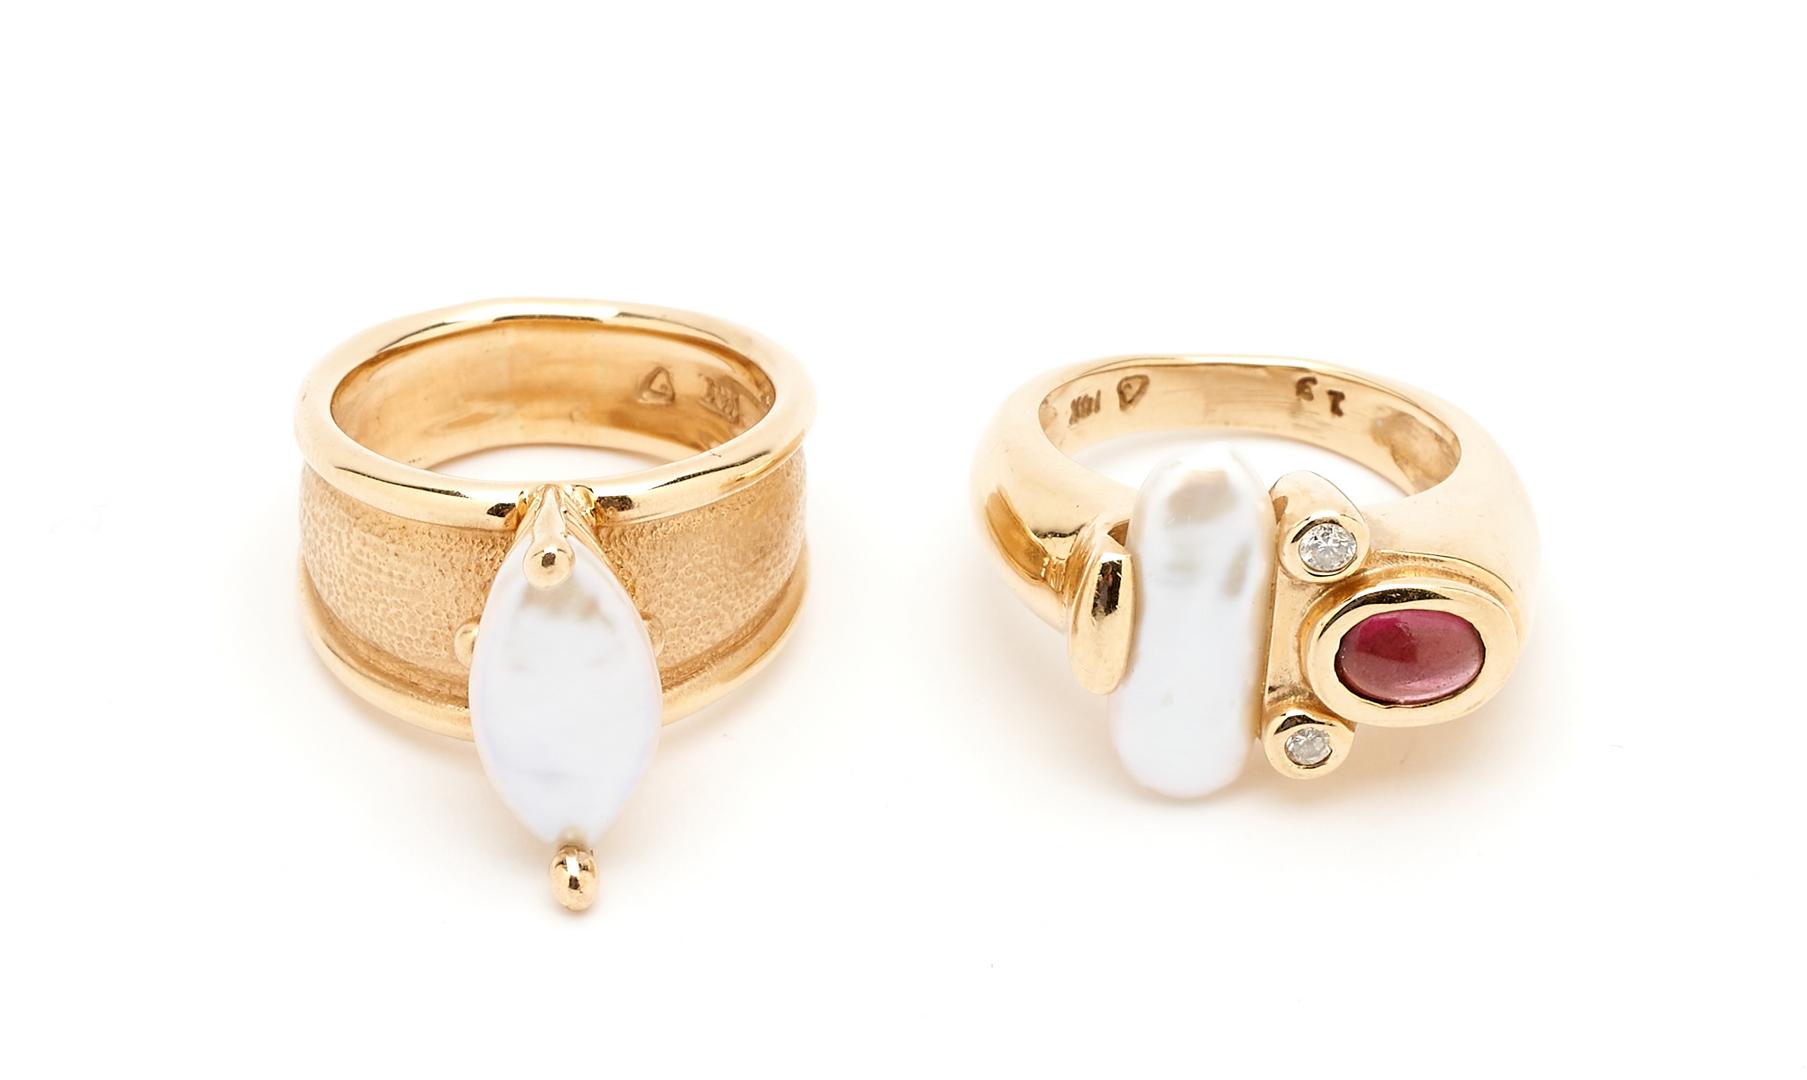 Lot 259: Ladies Freshwater Pearl Necklace & 2 Freshwater Pearl Rings